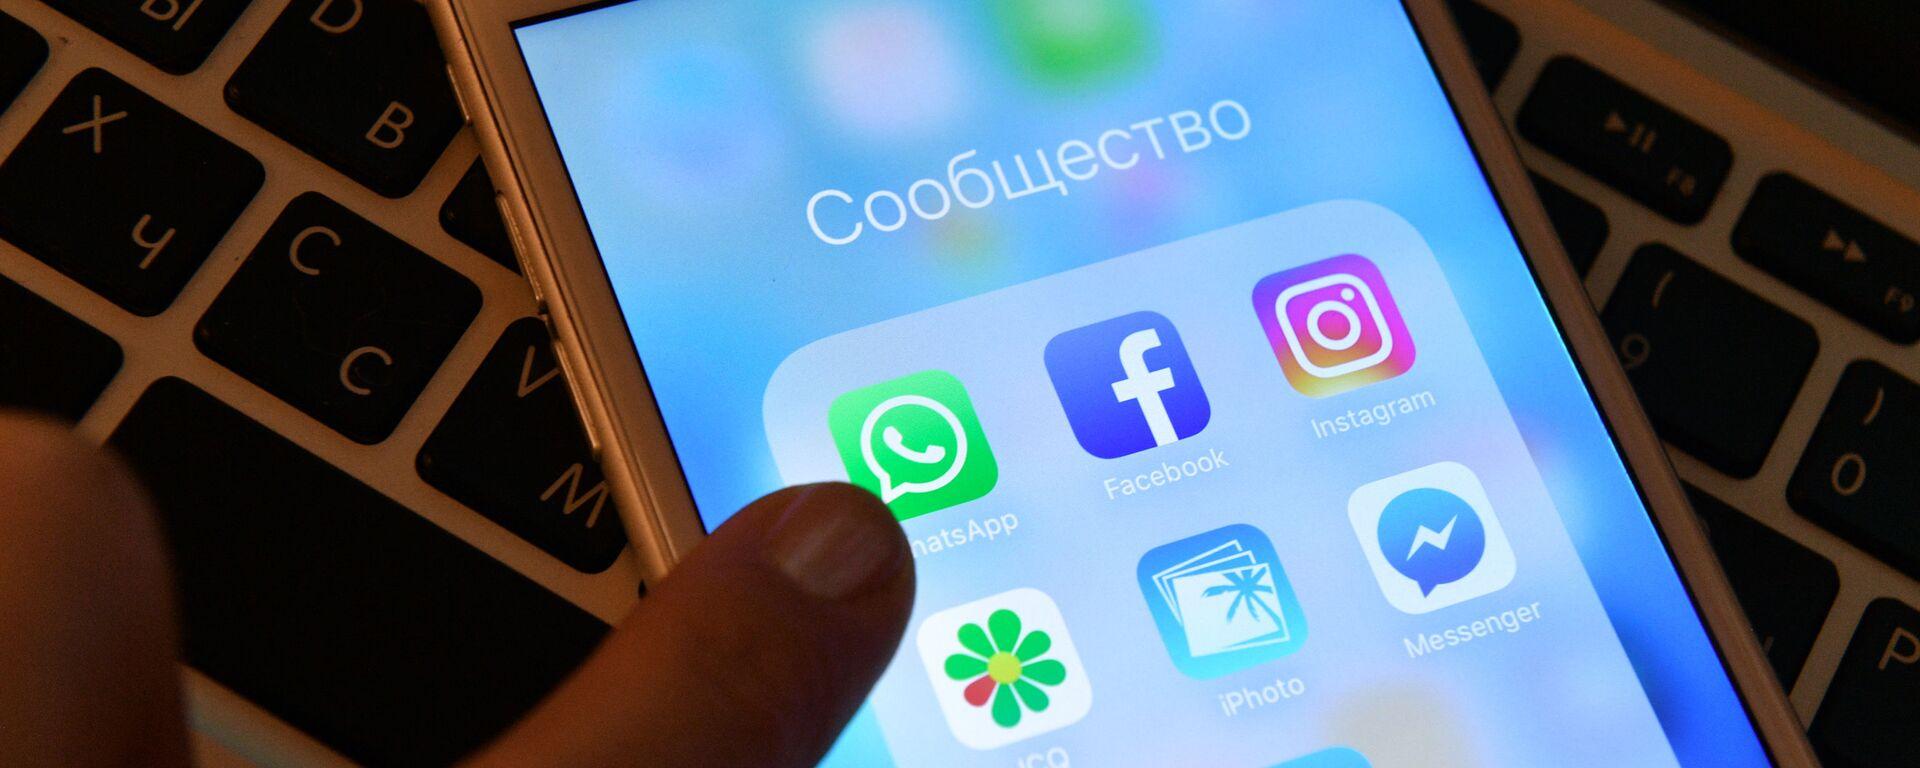 Иконка мессенджера WhatsApp на экране смартфона. - Sputnik Узбекистан, 1920, 31.03.2021